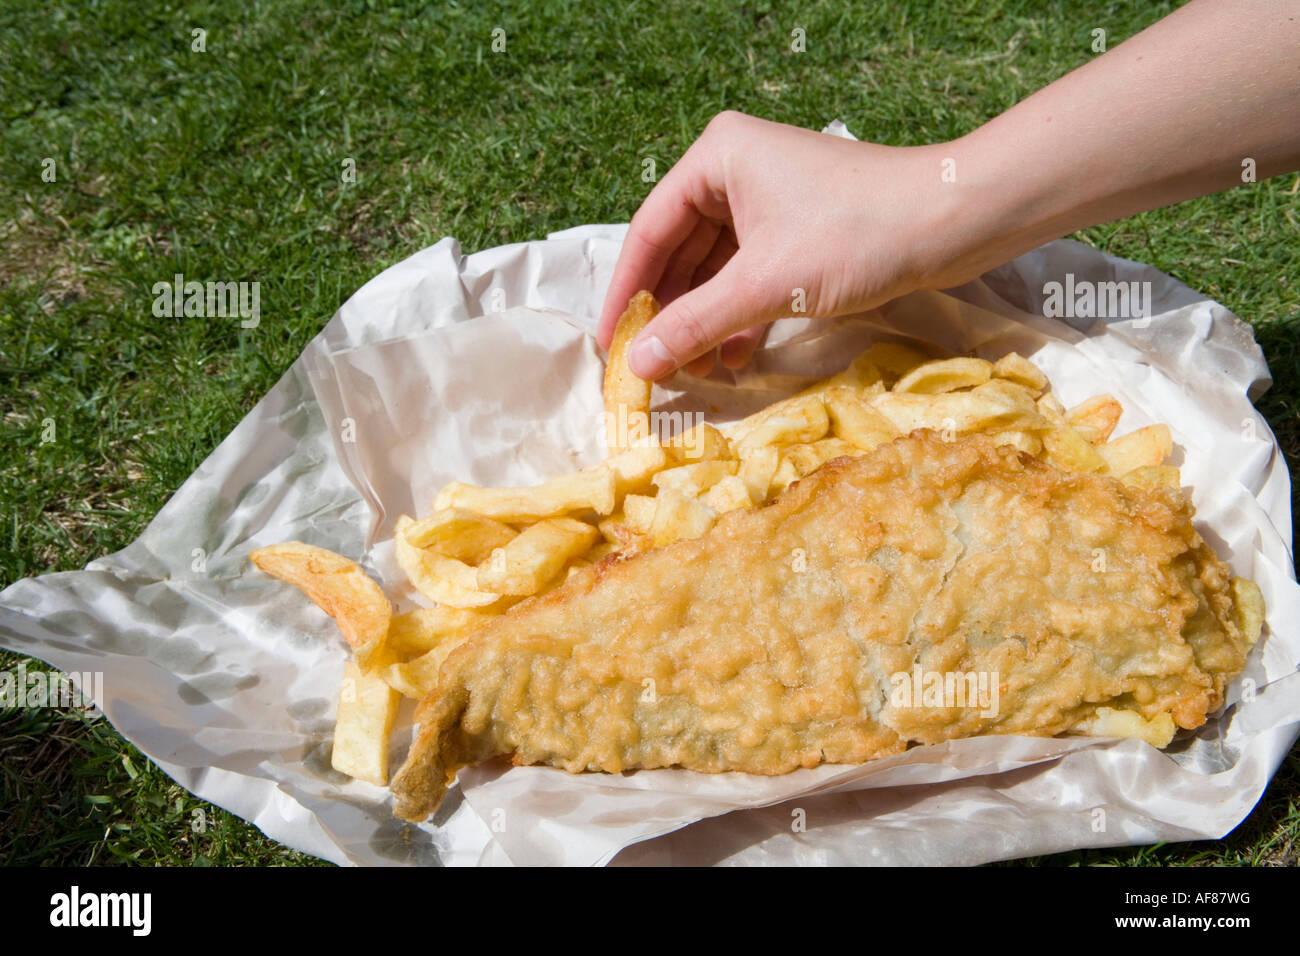 Enjoying Fish & Chips on Lawn, From Leo Burdock Fish & Chips Shop Stock Photo: 13863771 - Alamy